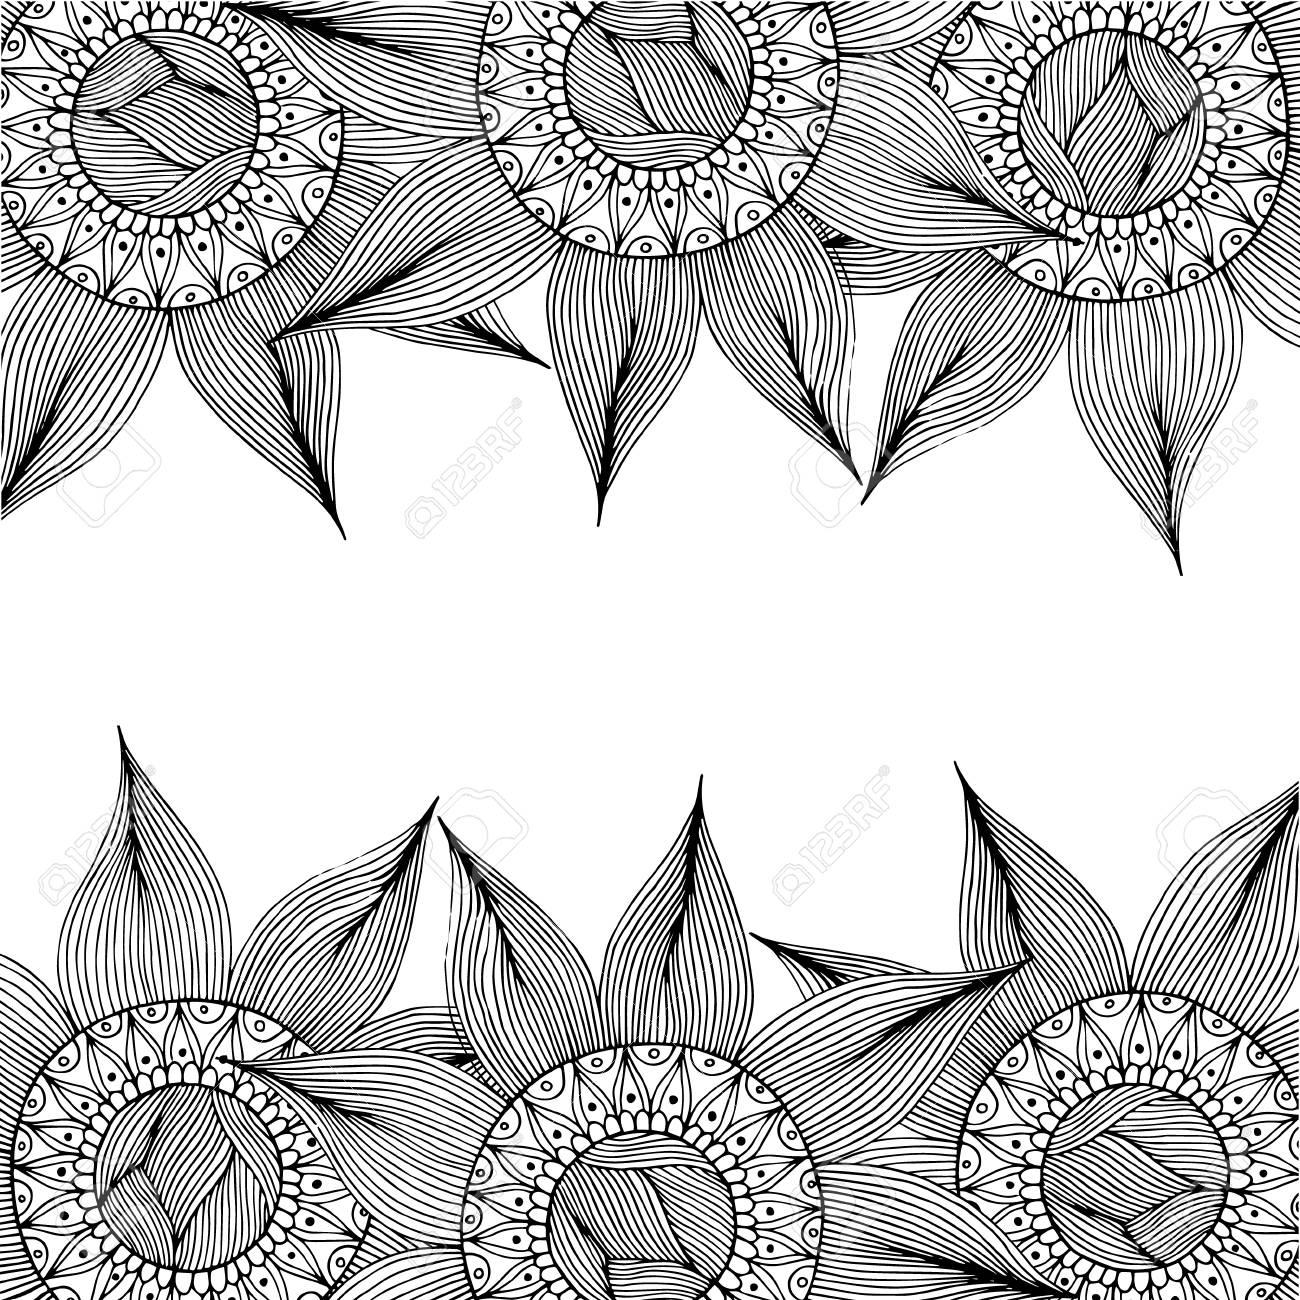 Dibujado A Mano Con Fondo De Tinta, Tarjeta Con Flores Abstractas ...